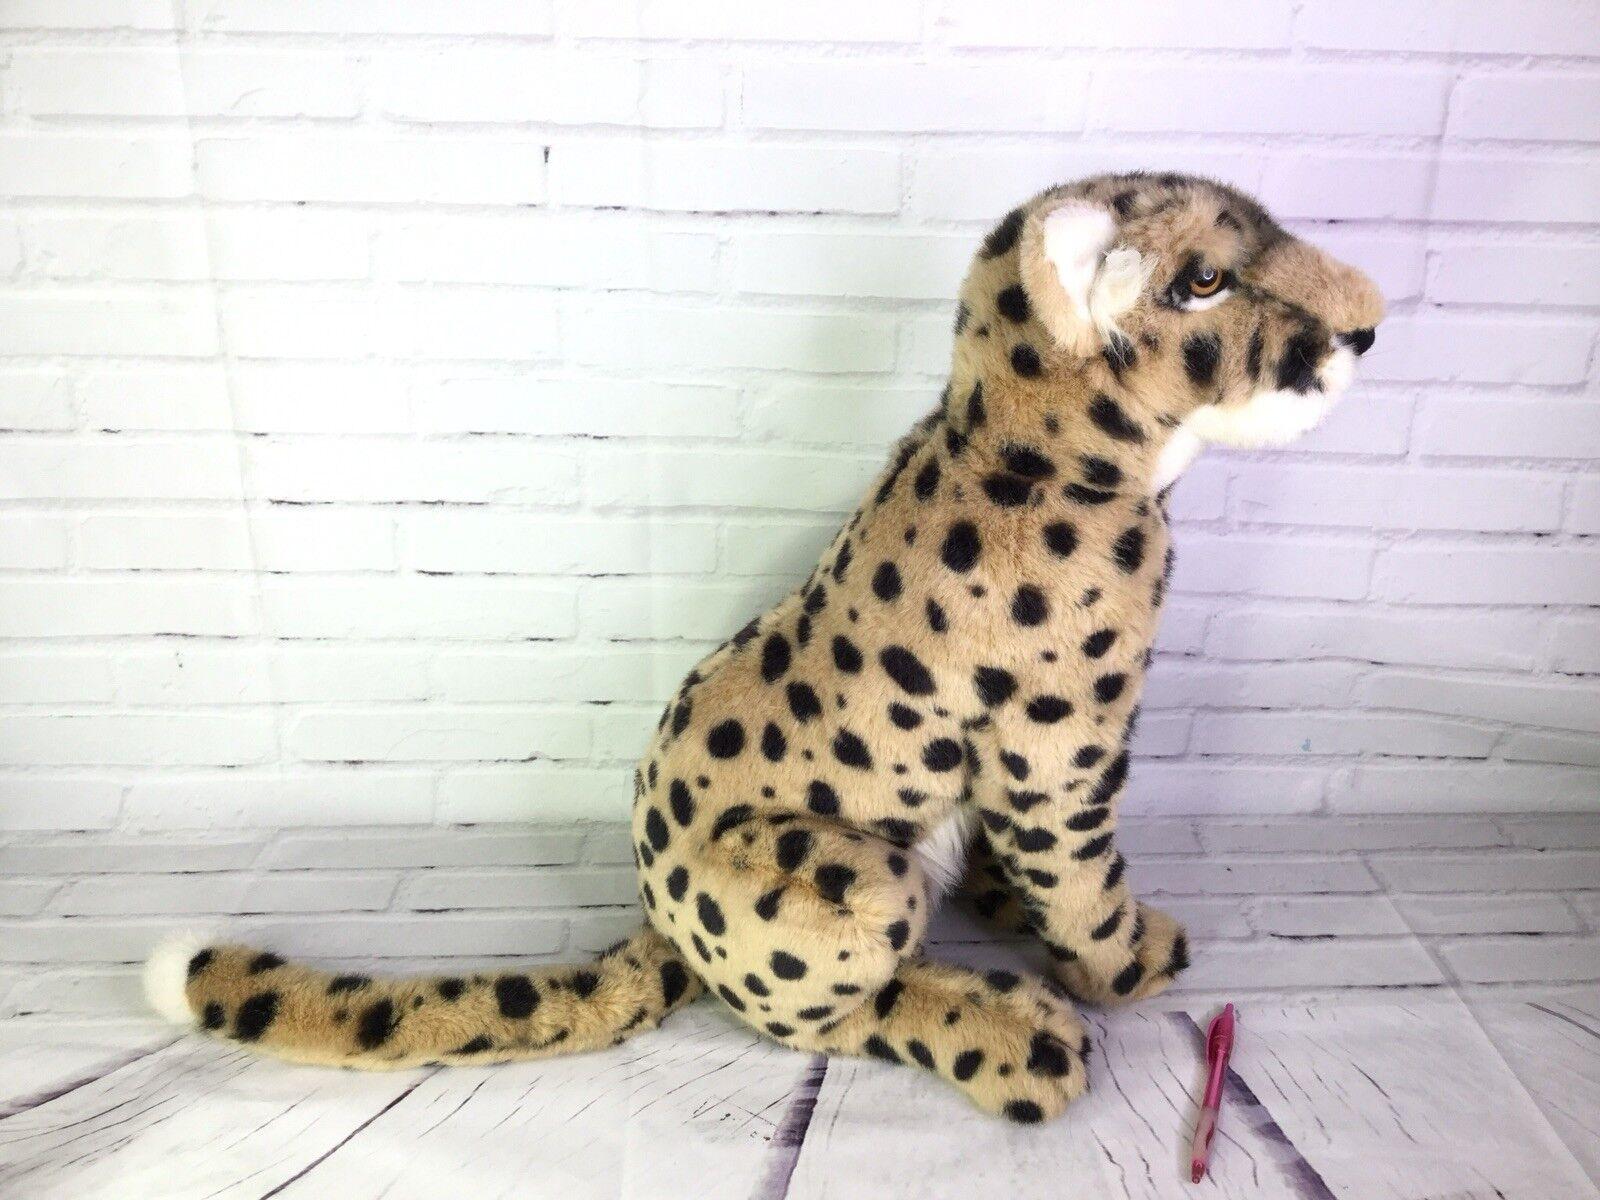 Vintage 1989 Wildlife Applause WWF Wildlife 1989 Cheetah Large Cat Plush Stuffed Animal RARE b017bc